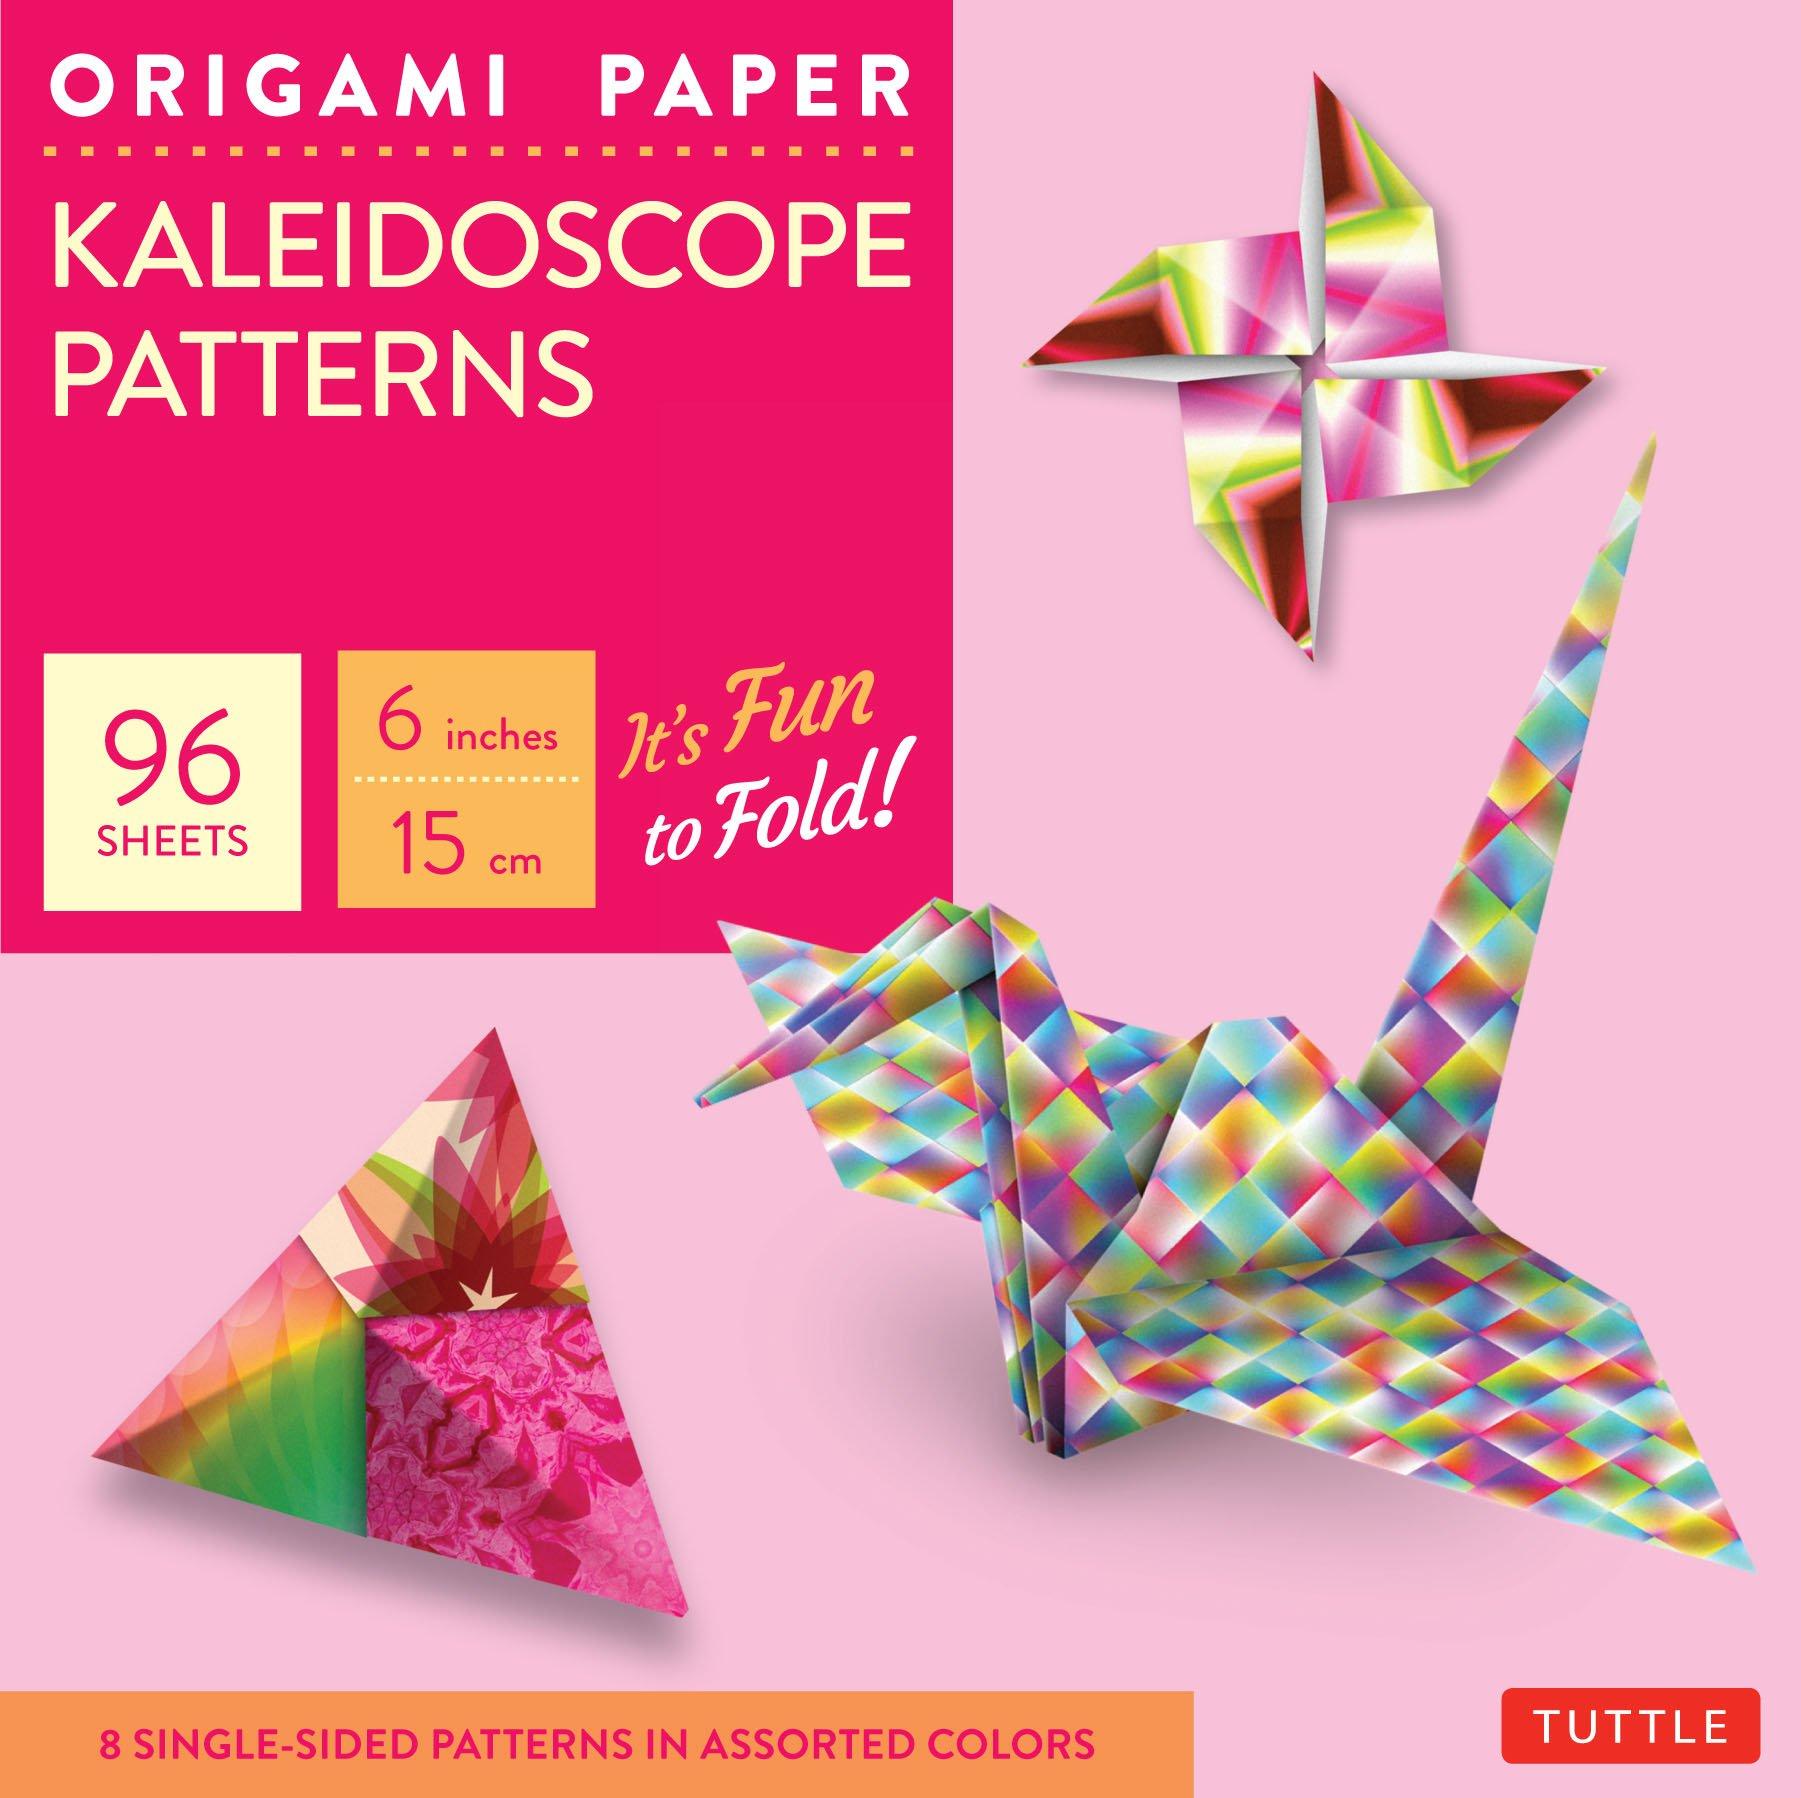 Origami Paper - Kaleidoscope Patterns - 6